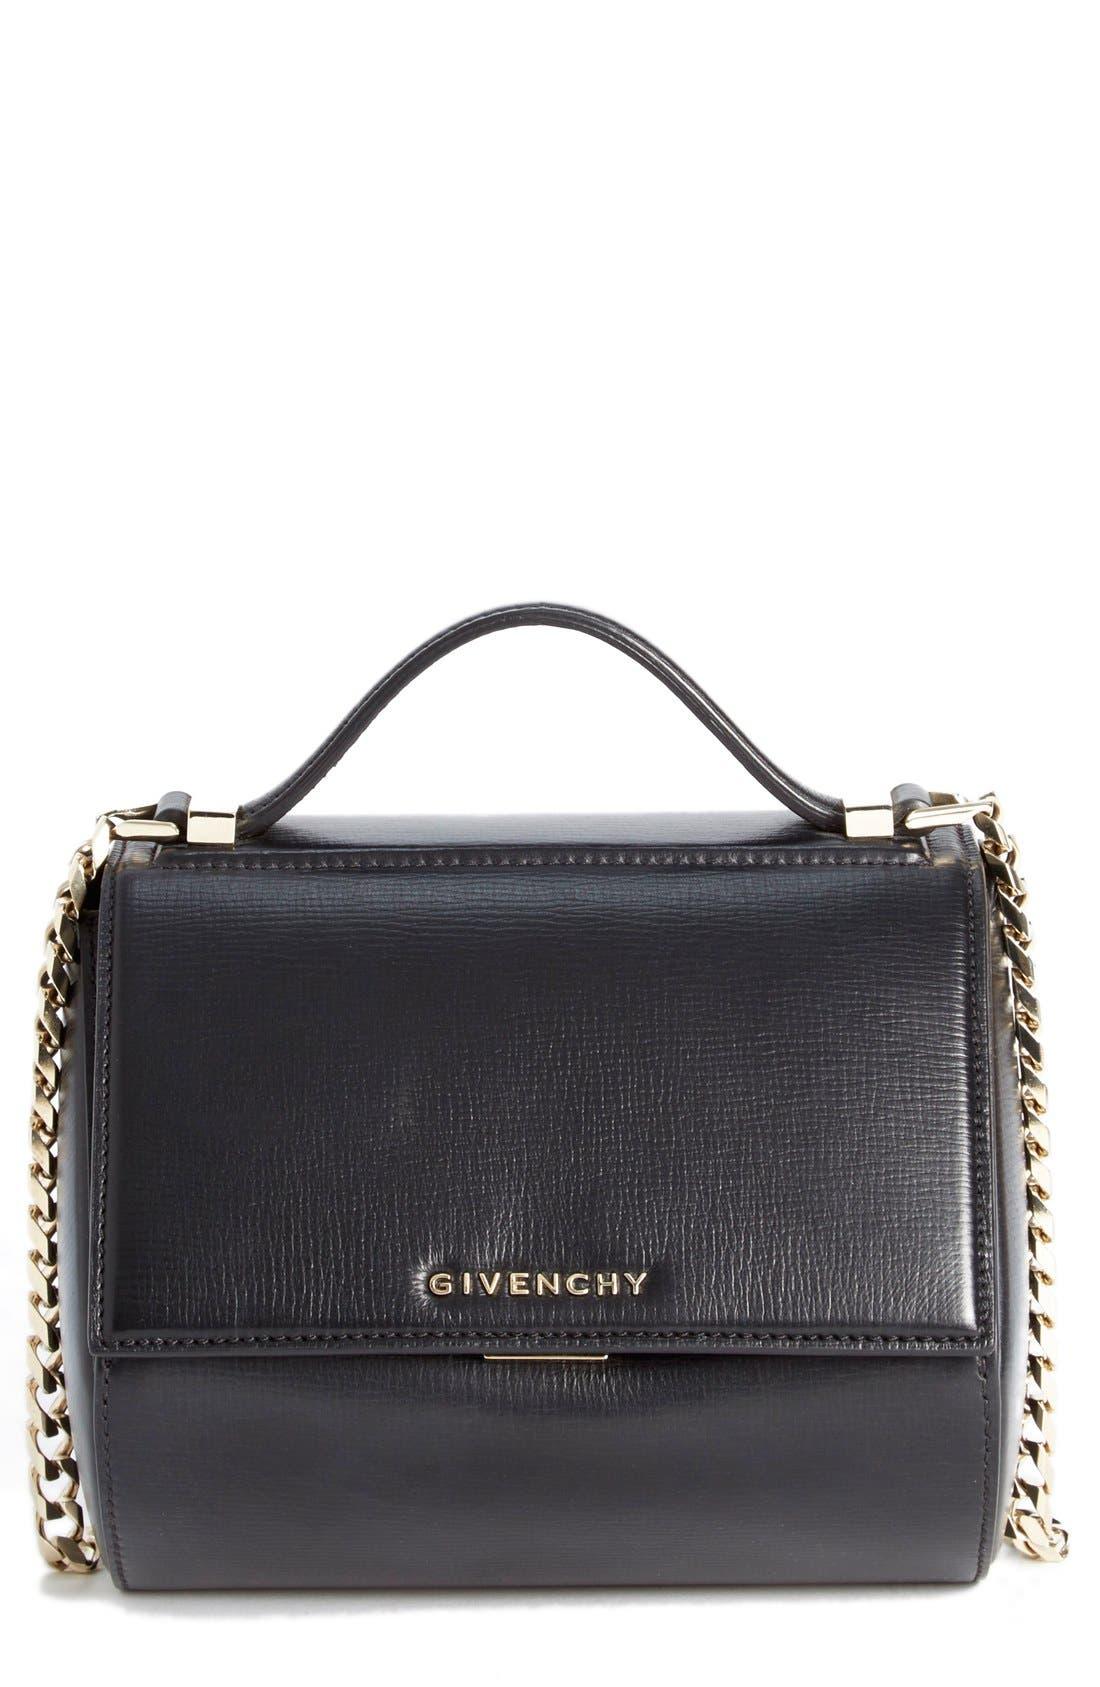 Givenchy 'Mini Pandora Box - Palma' Leather Shoulder Bag